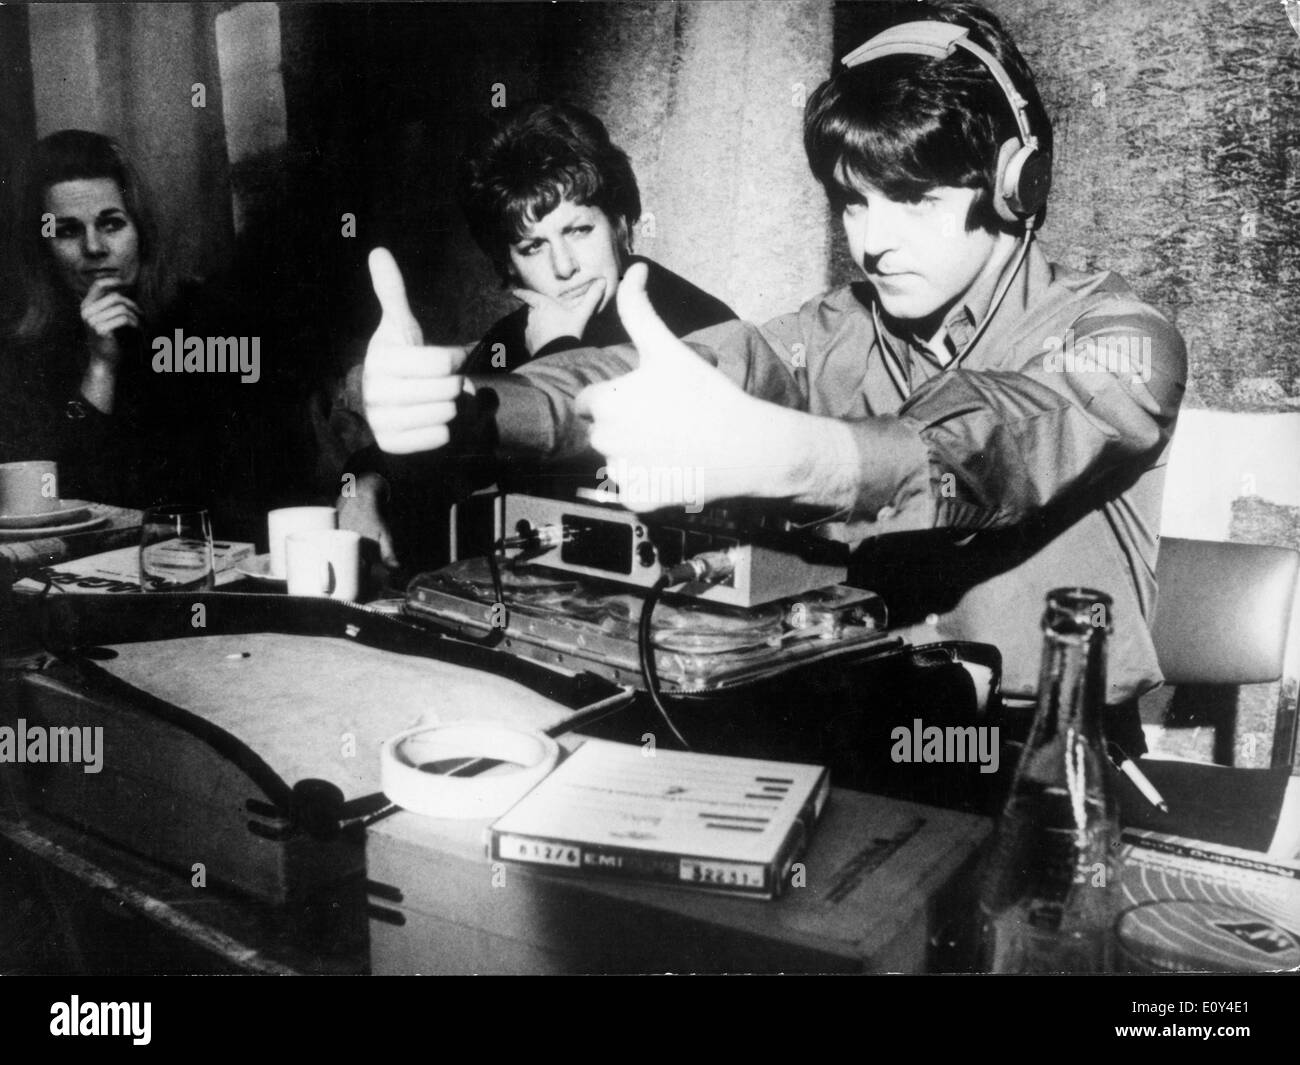 Singer Paul McCartney in studio recording cartoon - Stock Image